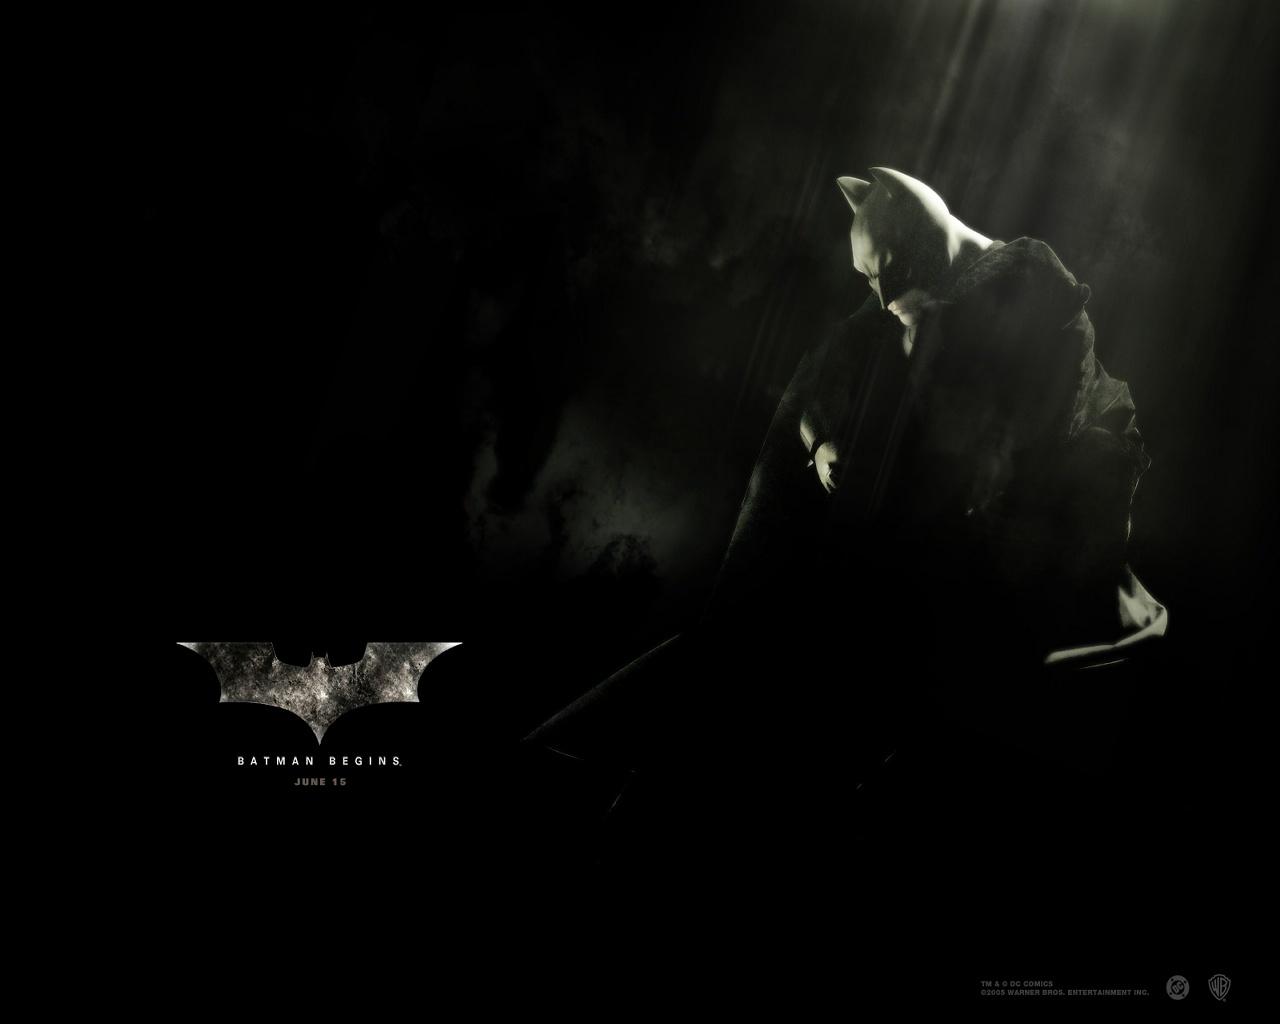 Batman Begins Movie Wallpapers Wallpaper World 1280x1024